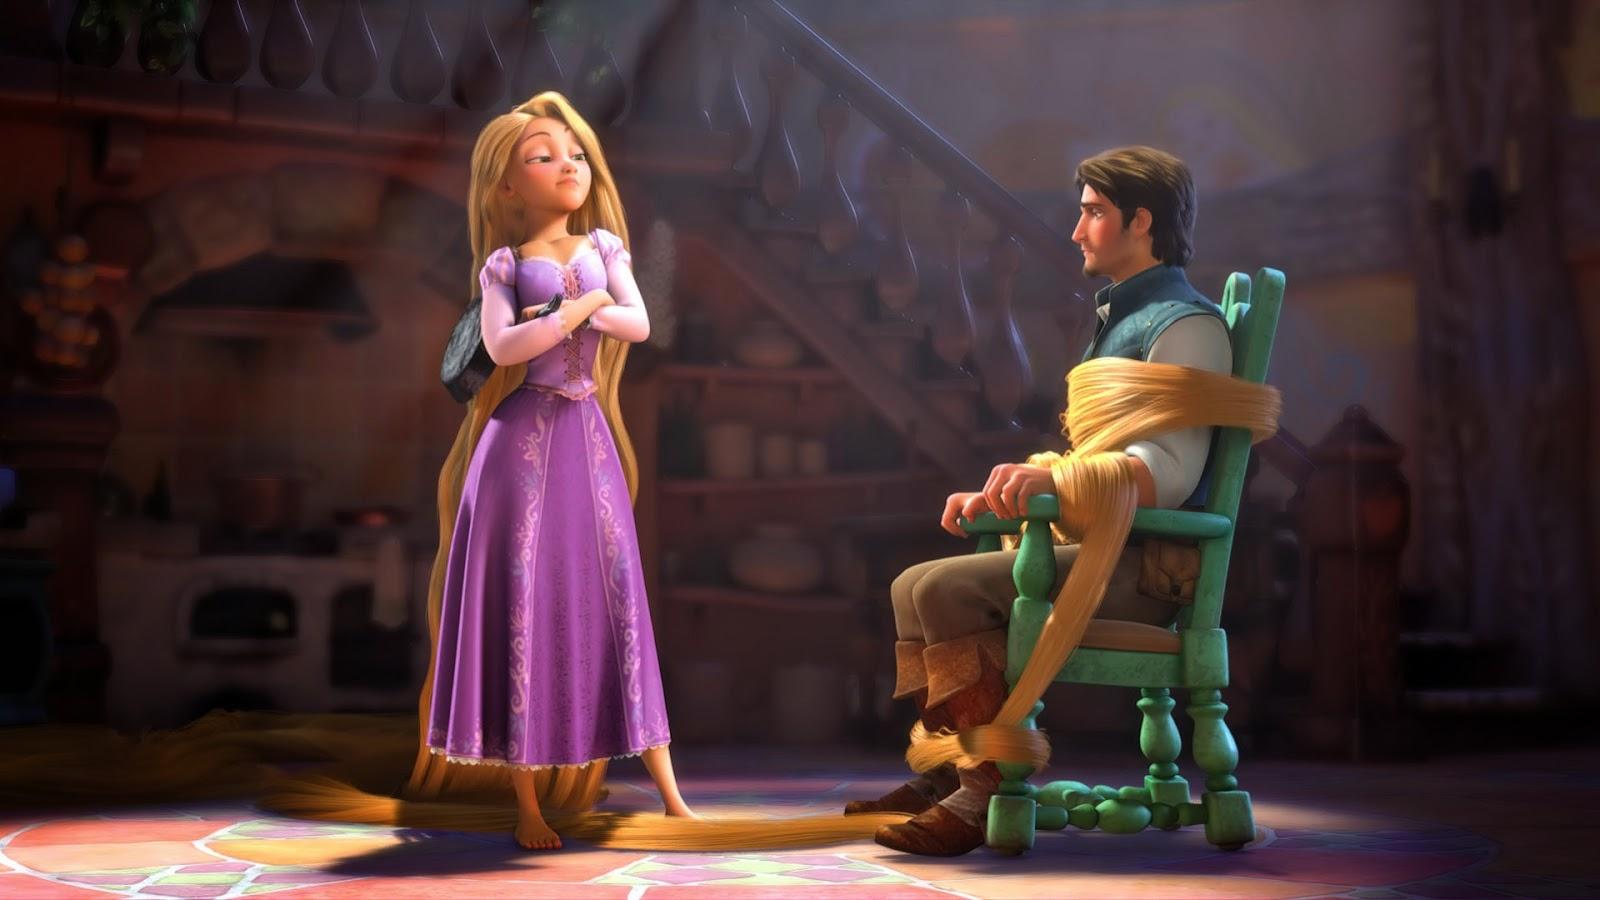 My Five Favorite Disney Animated Films